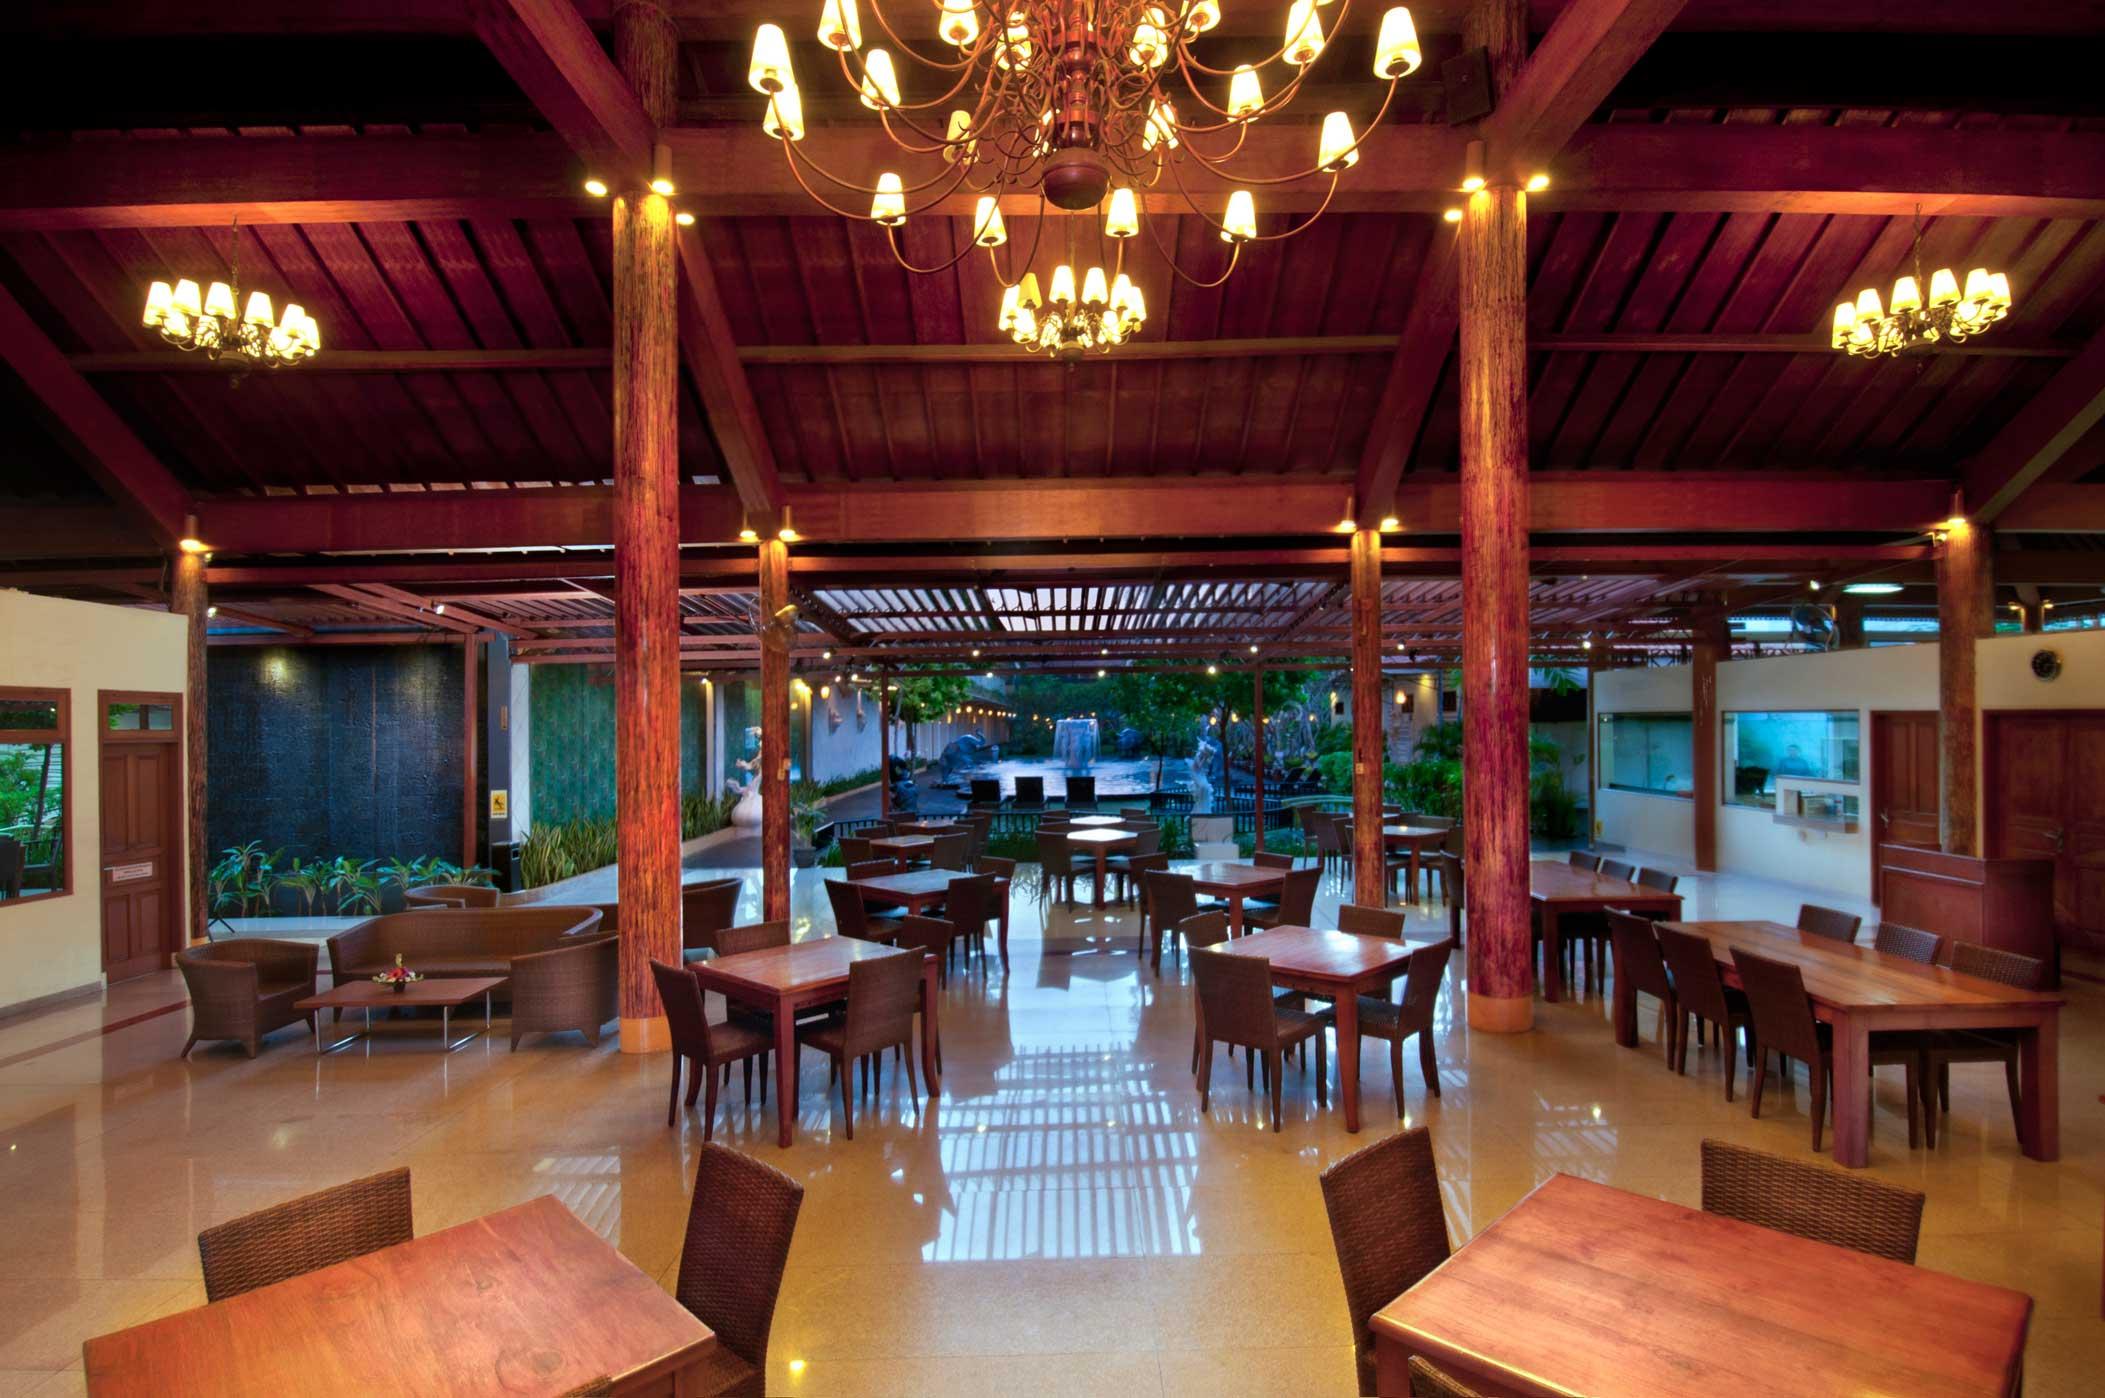 Febri's Restaurant